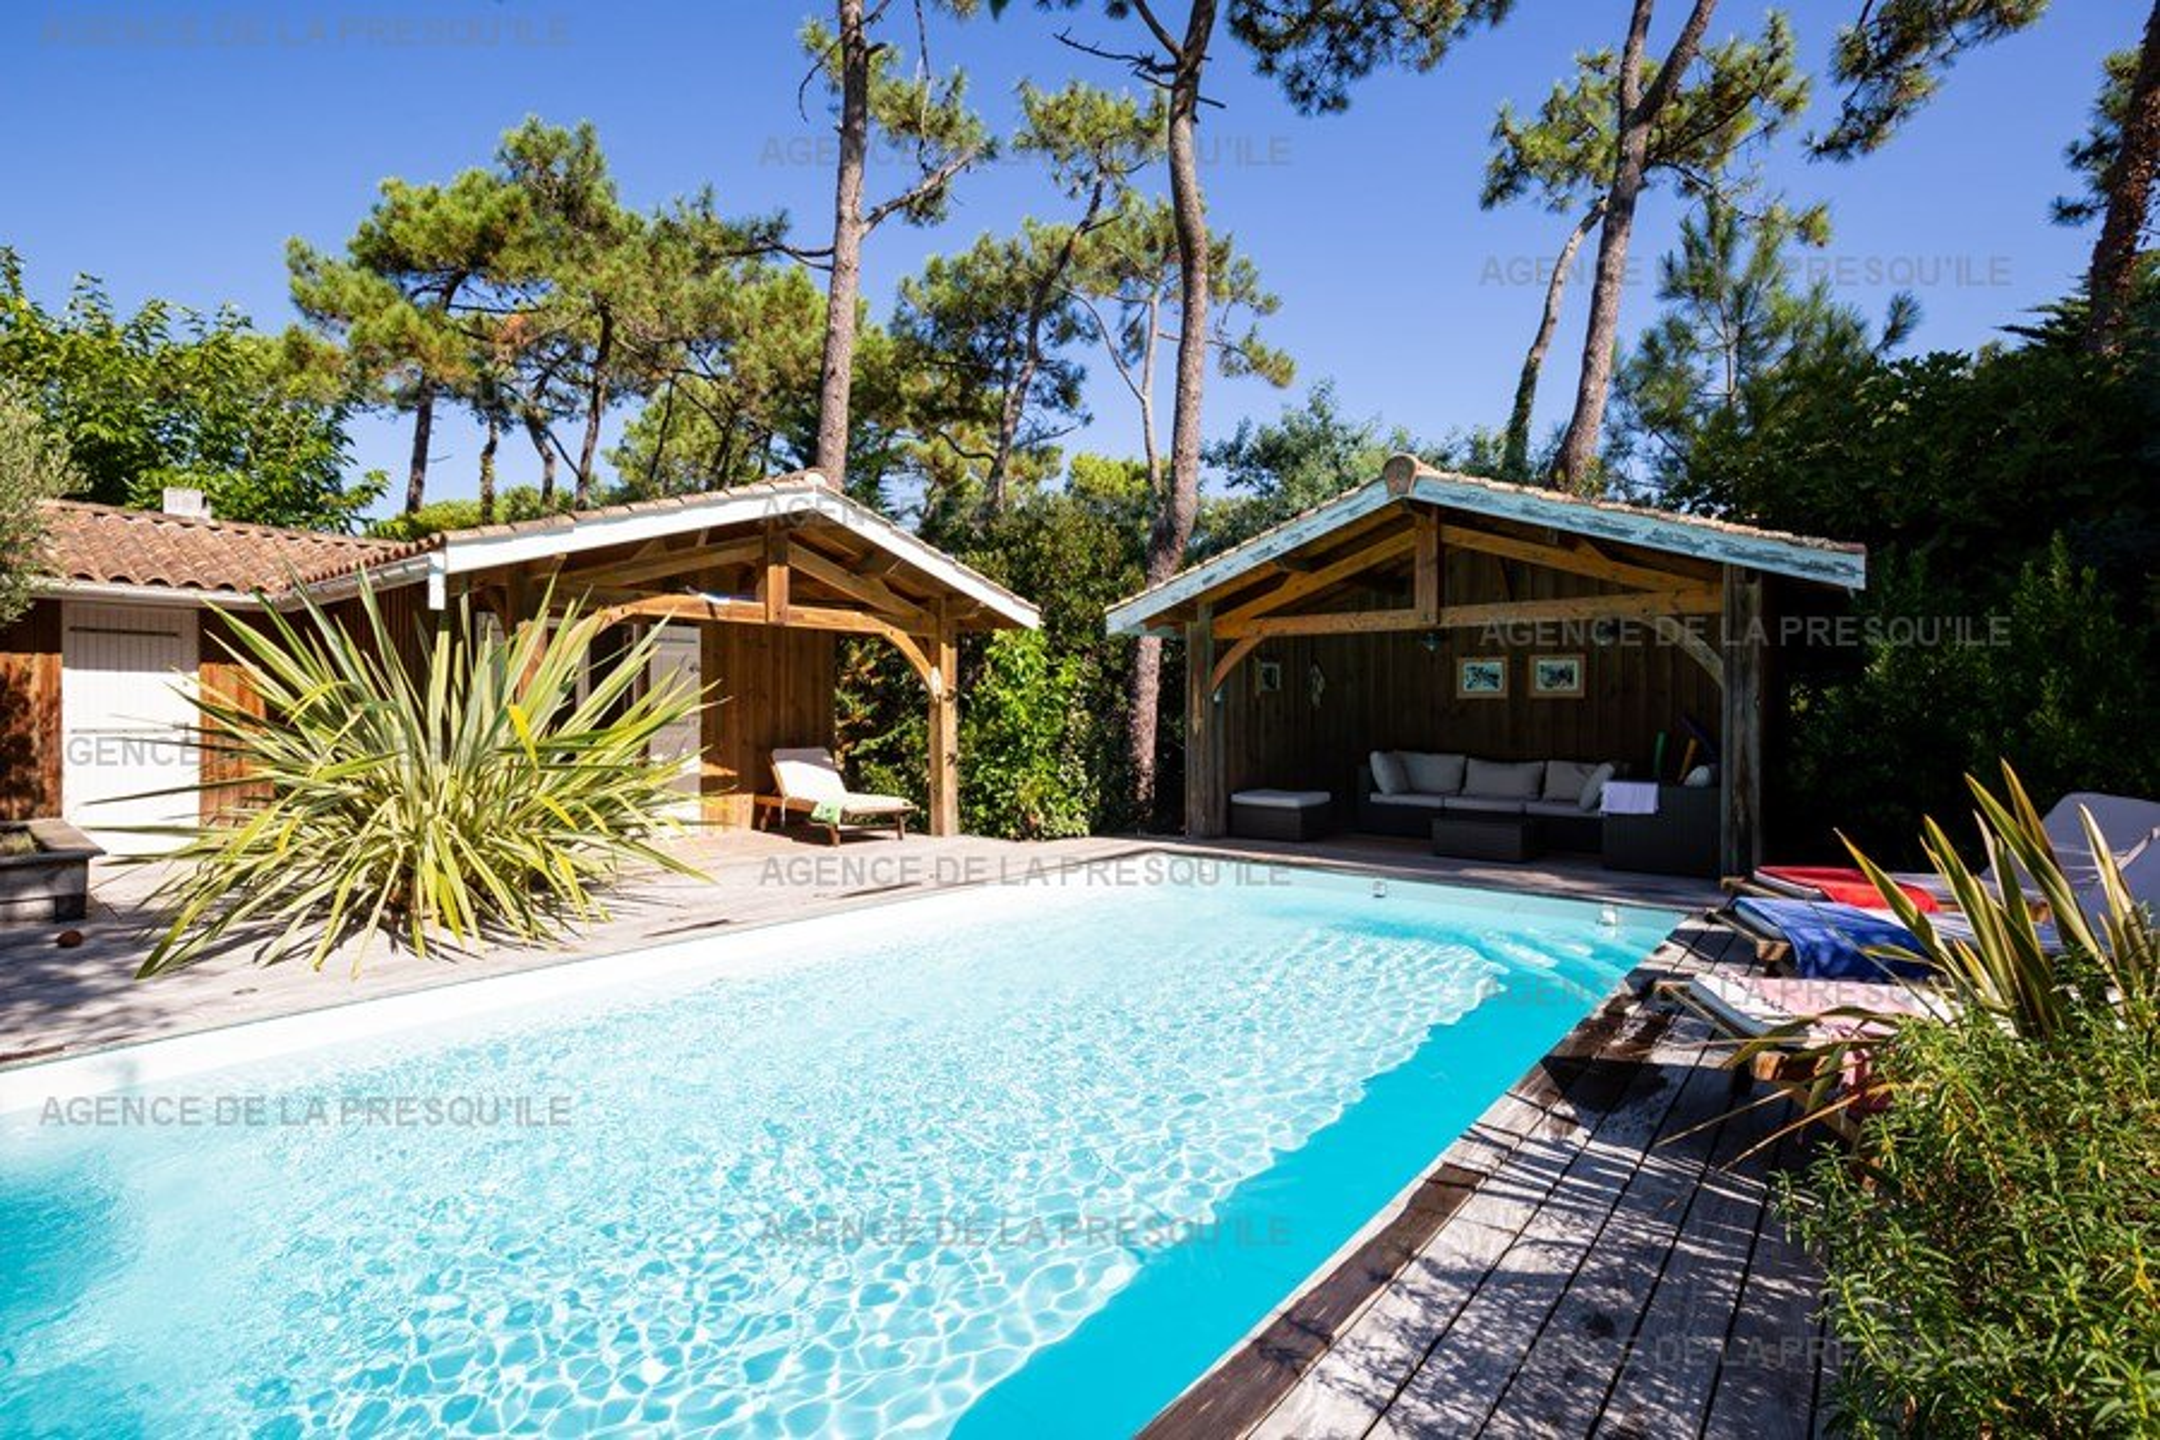 Location: Charmante villa avec piscine entre bassin et océan 7